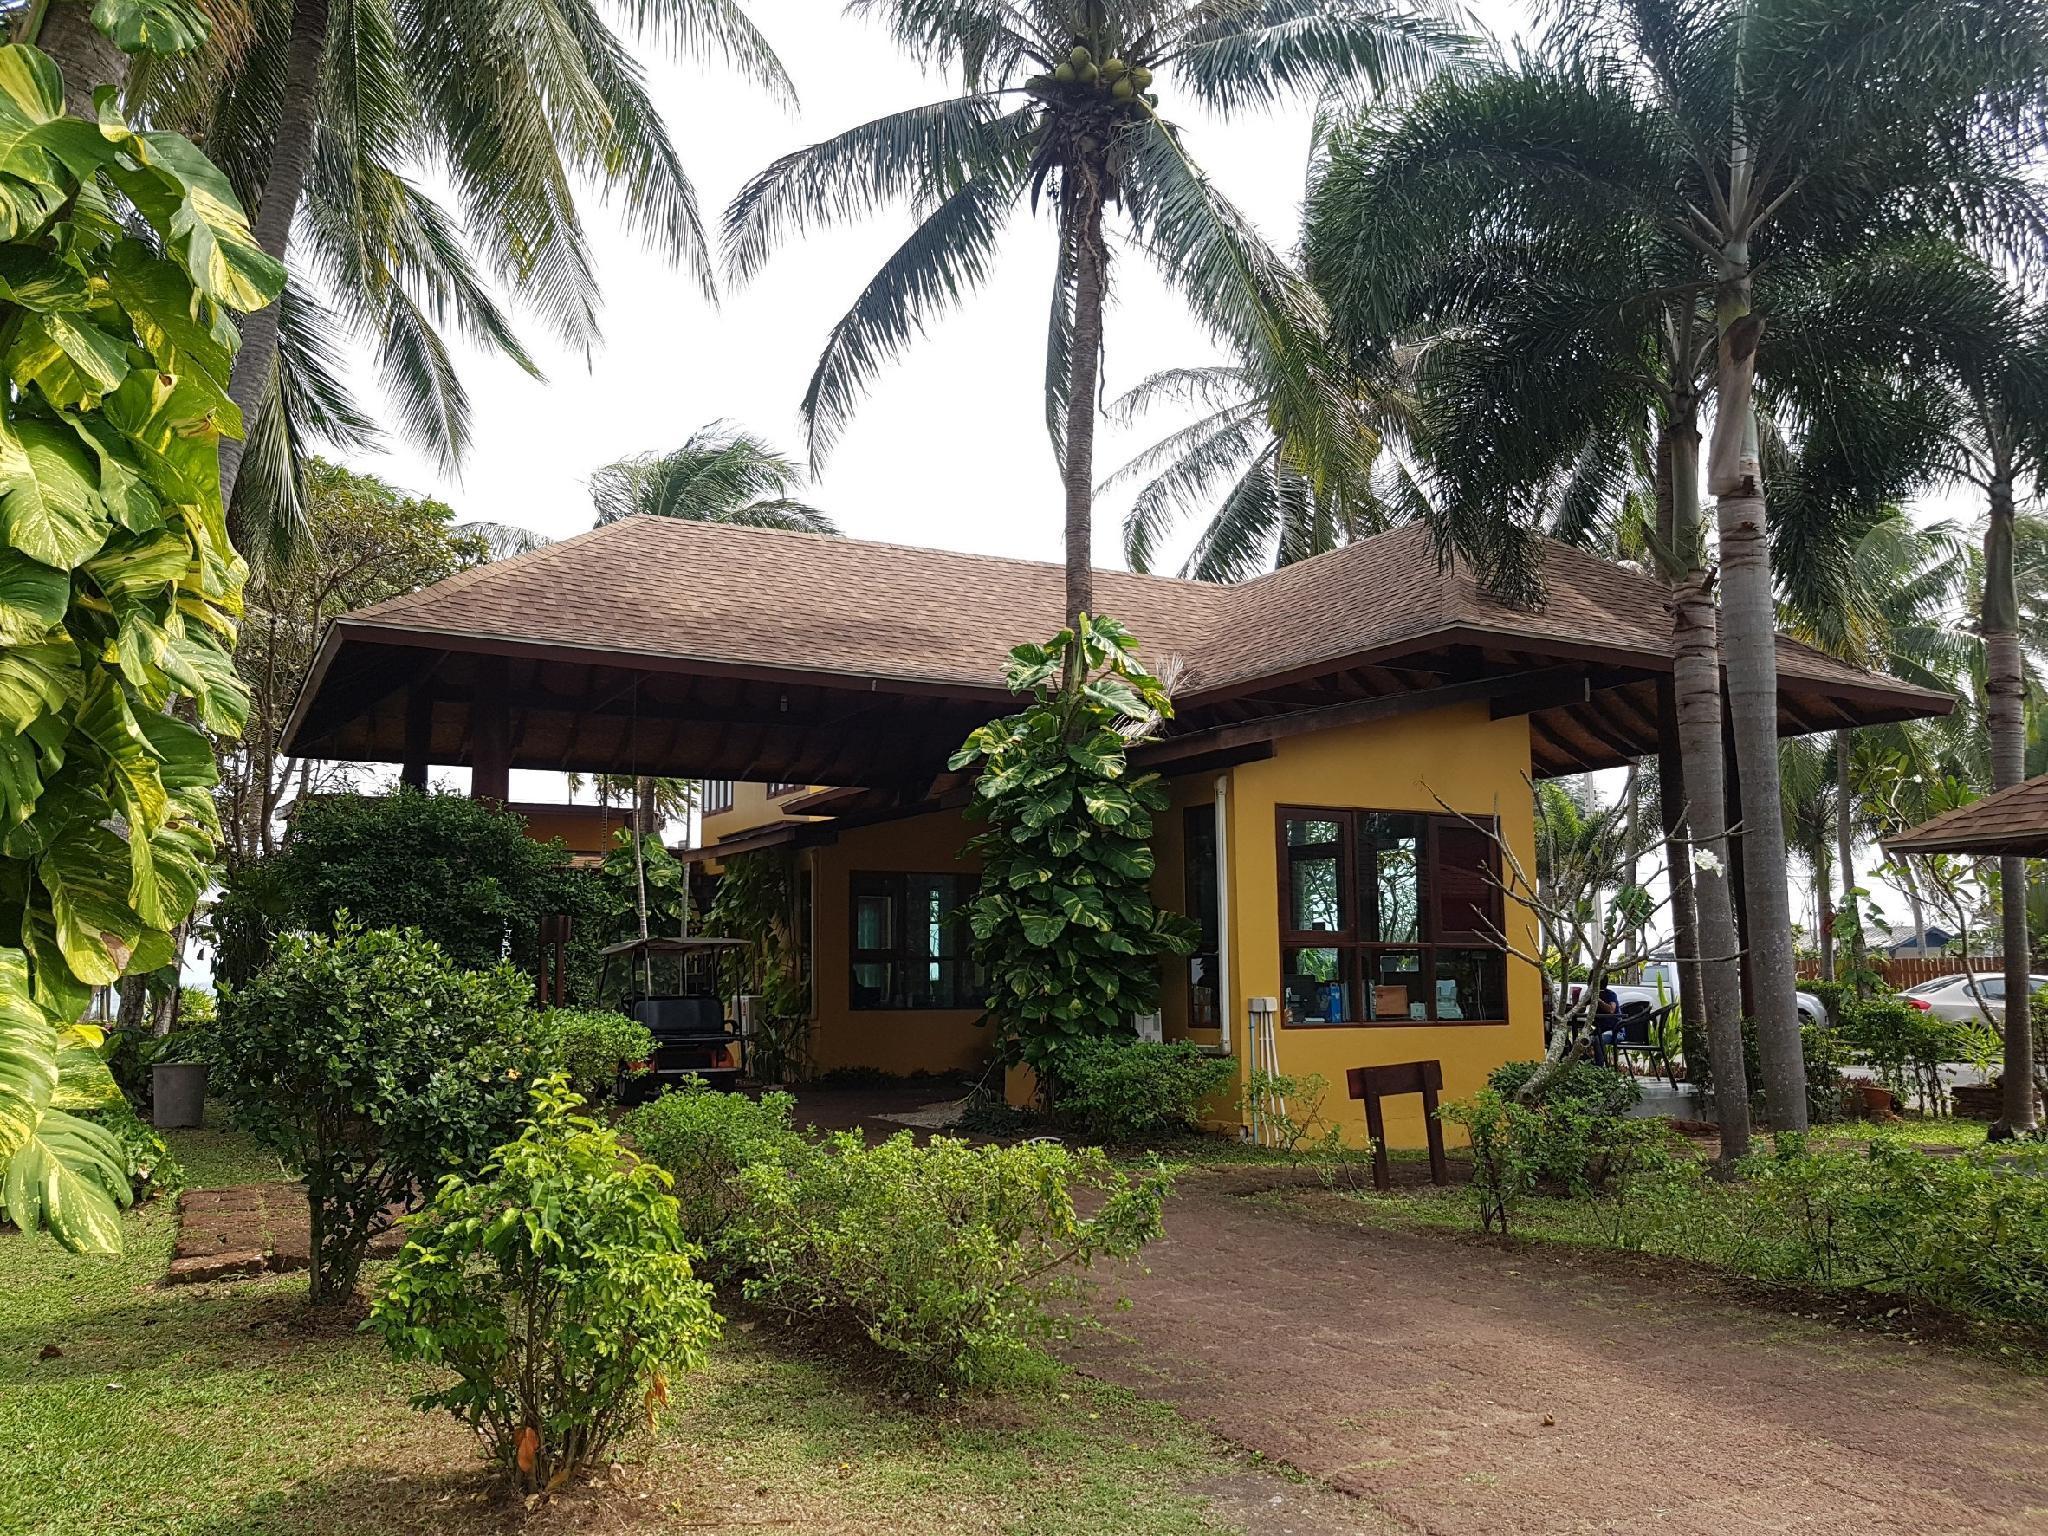 基瑞瓦瑞海滨水疗别墅,Keeree Waree Seaside Villa & Spa